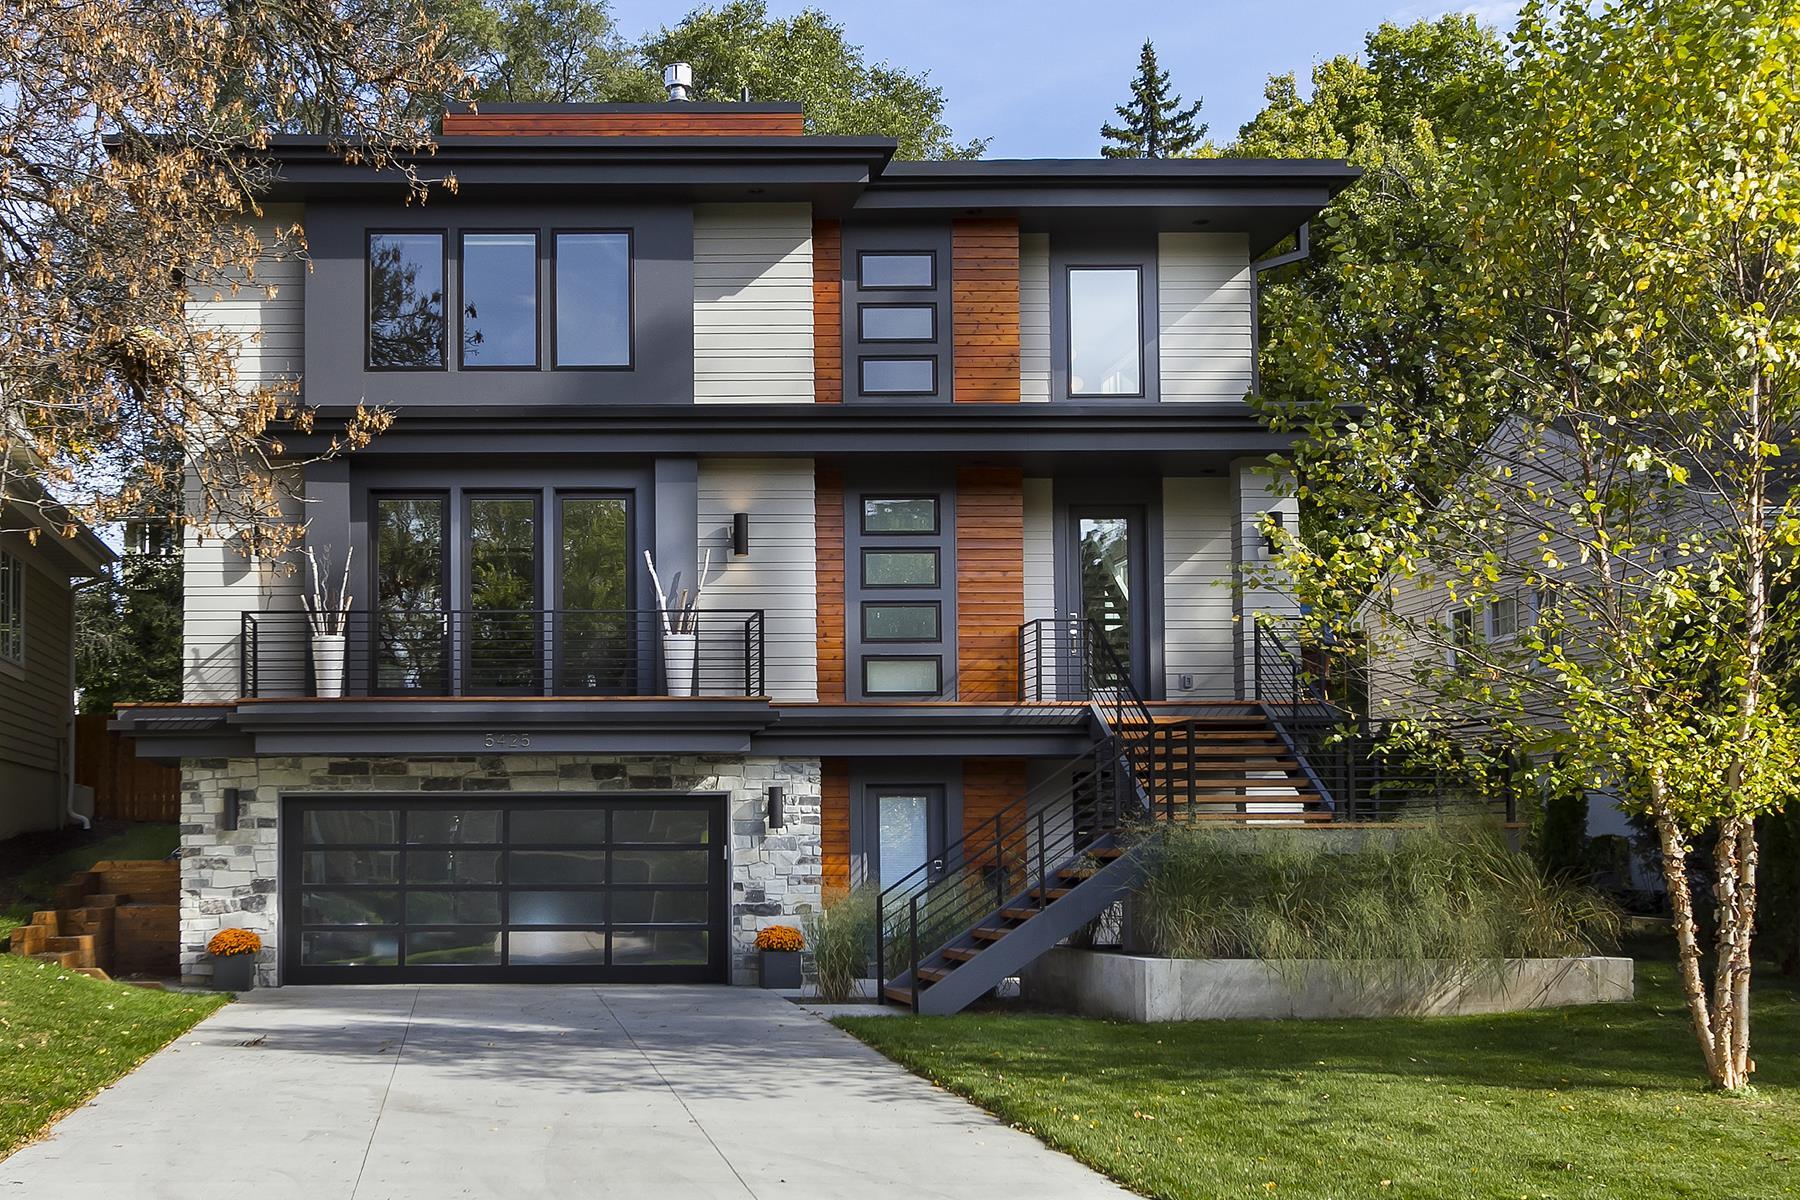 Villa per Vendita alle ore 5425 Halifax Lane Edina, Minnesota, 55424 Stati Uniti